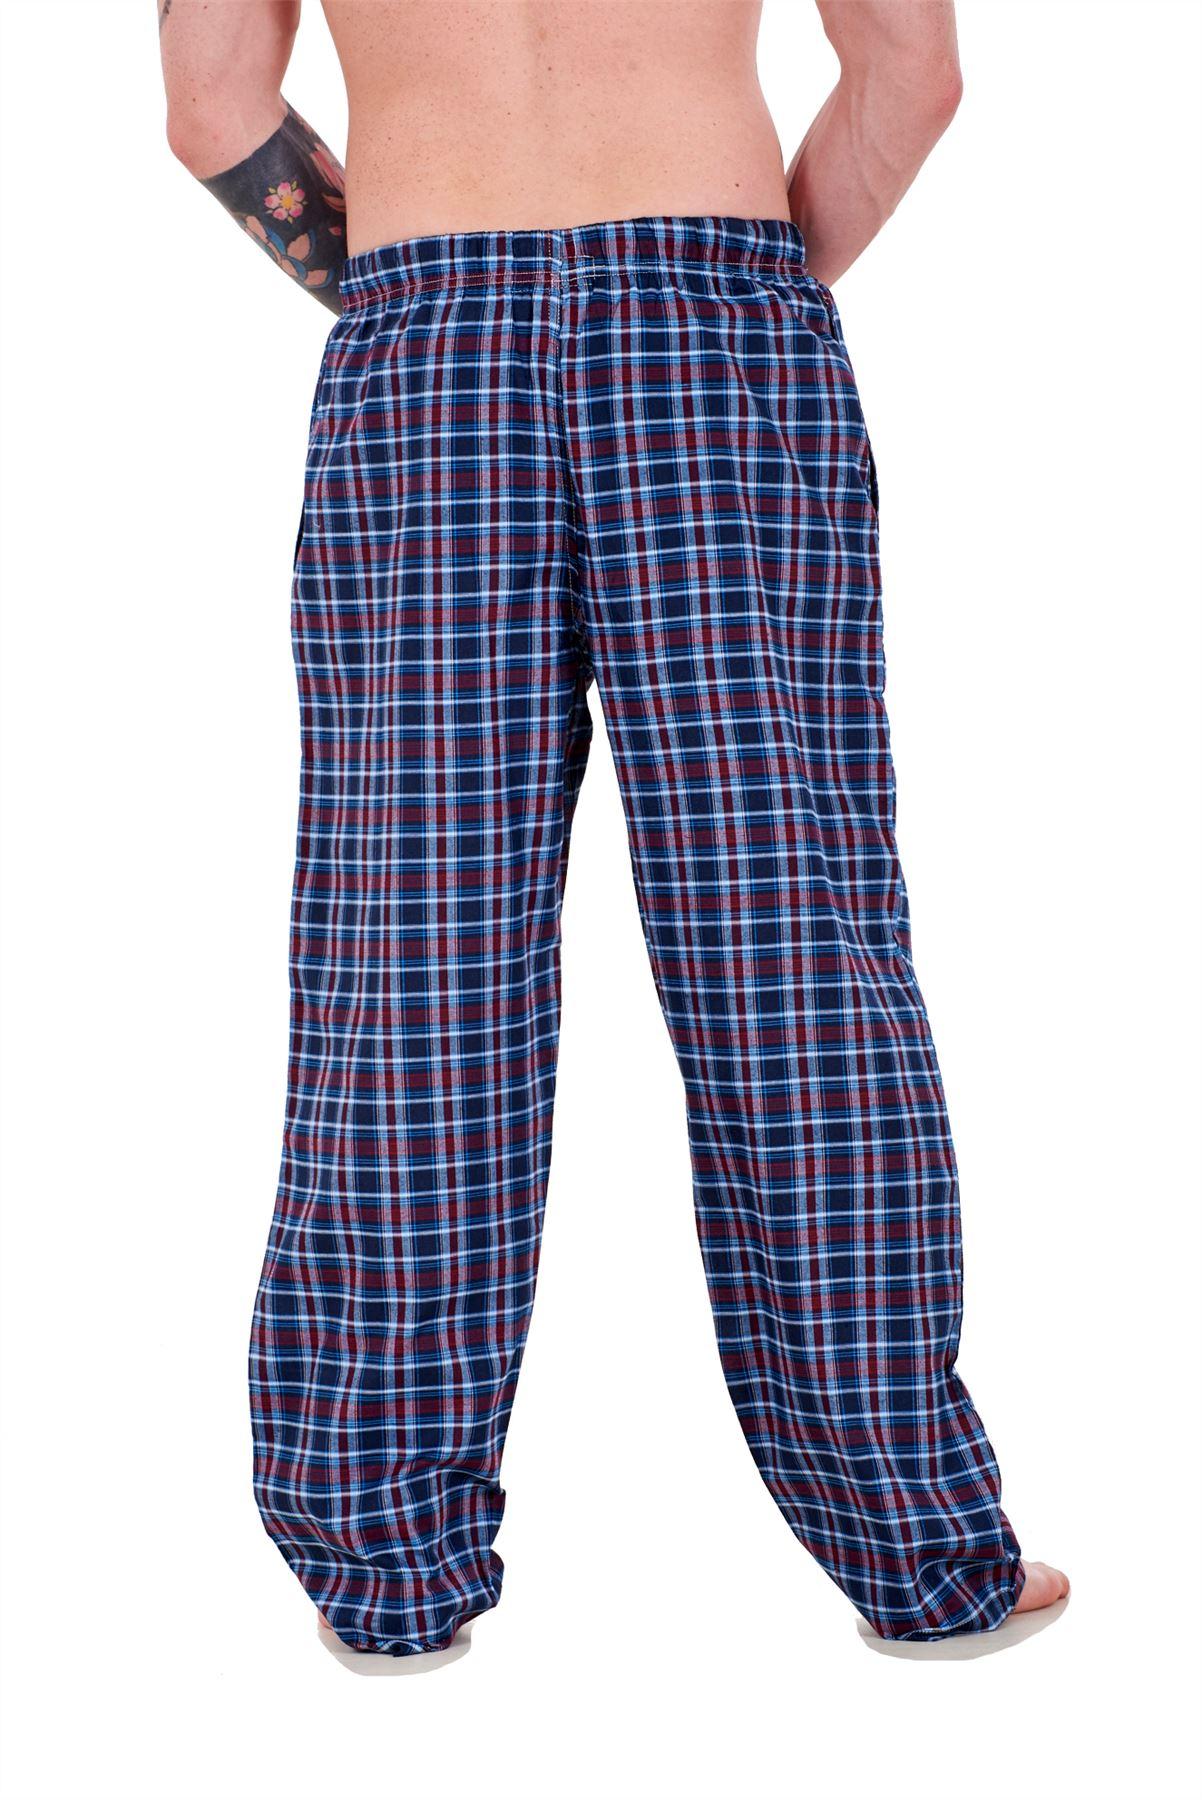 Mens-Pyjama-Bottoms-Rich-Cotton-Woven-Check-Lounge-Pant-Nightwear-Big-3XL-to-5XL Indexbild 53